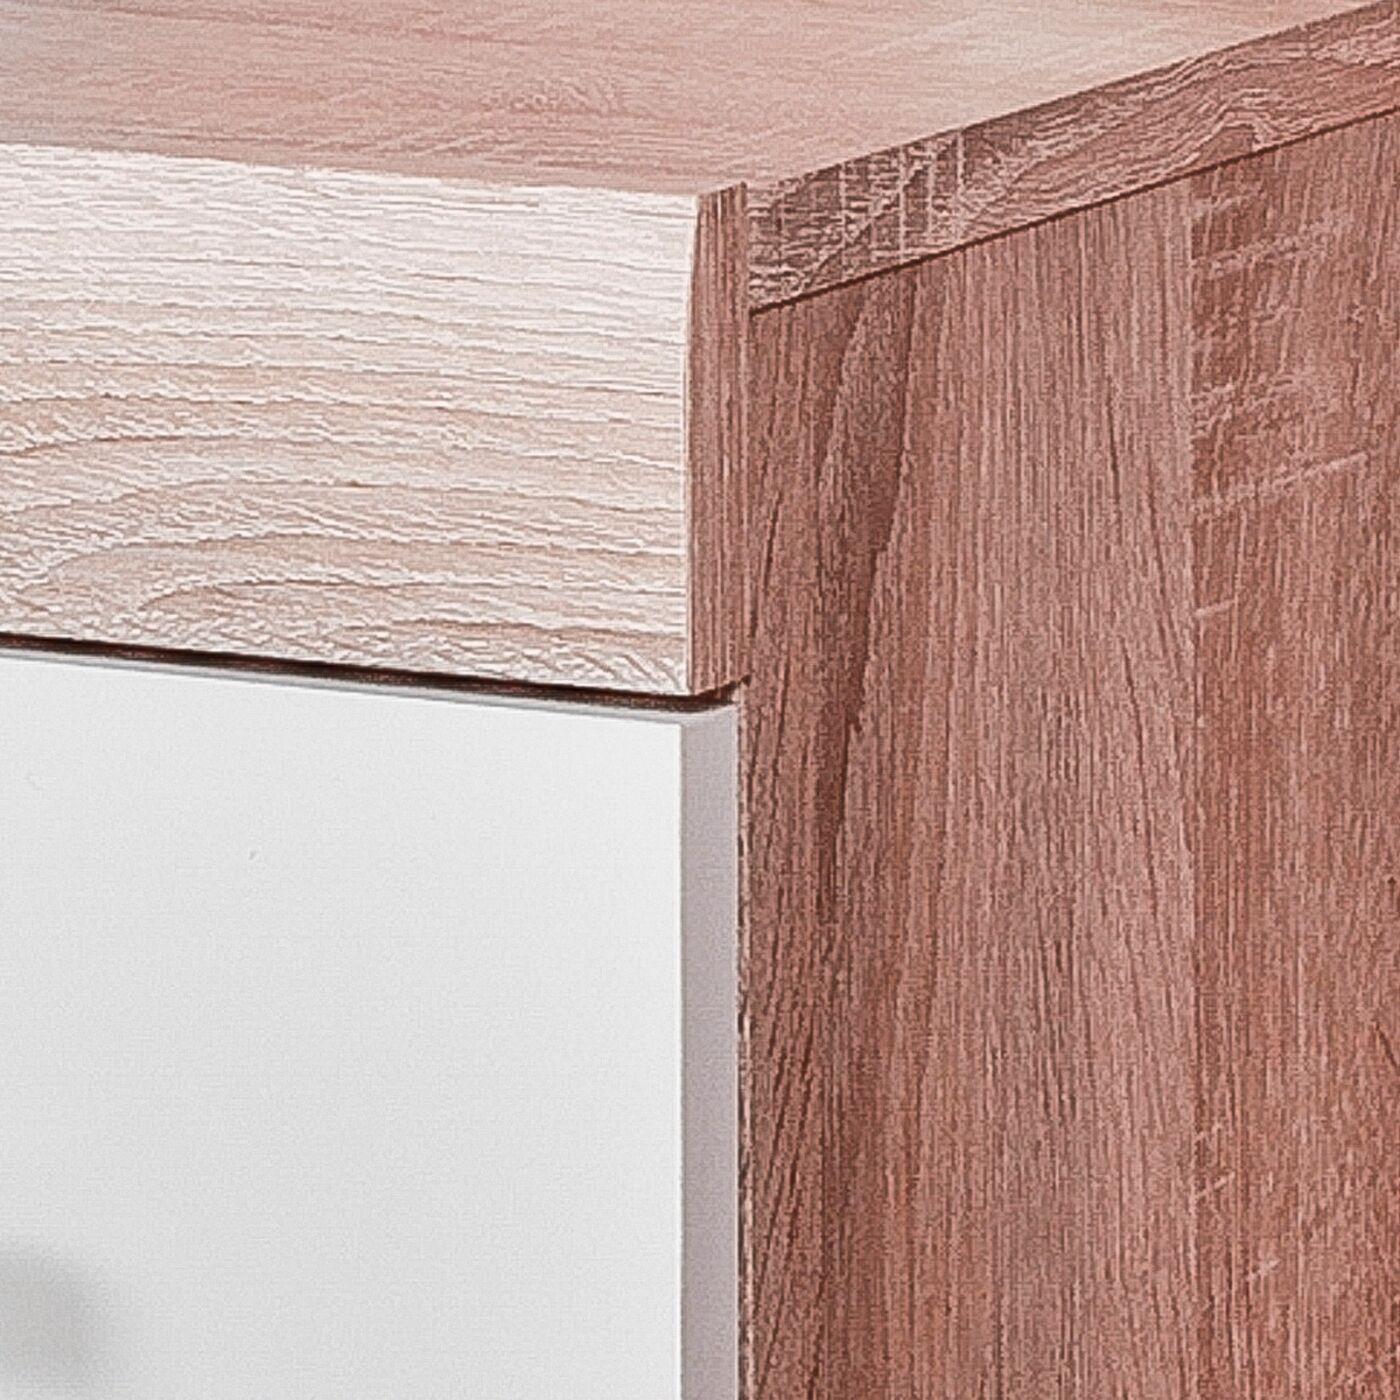 White sonoma oak large 2 door 2 drawer sideboard for Door 9 sonoma